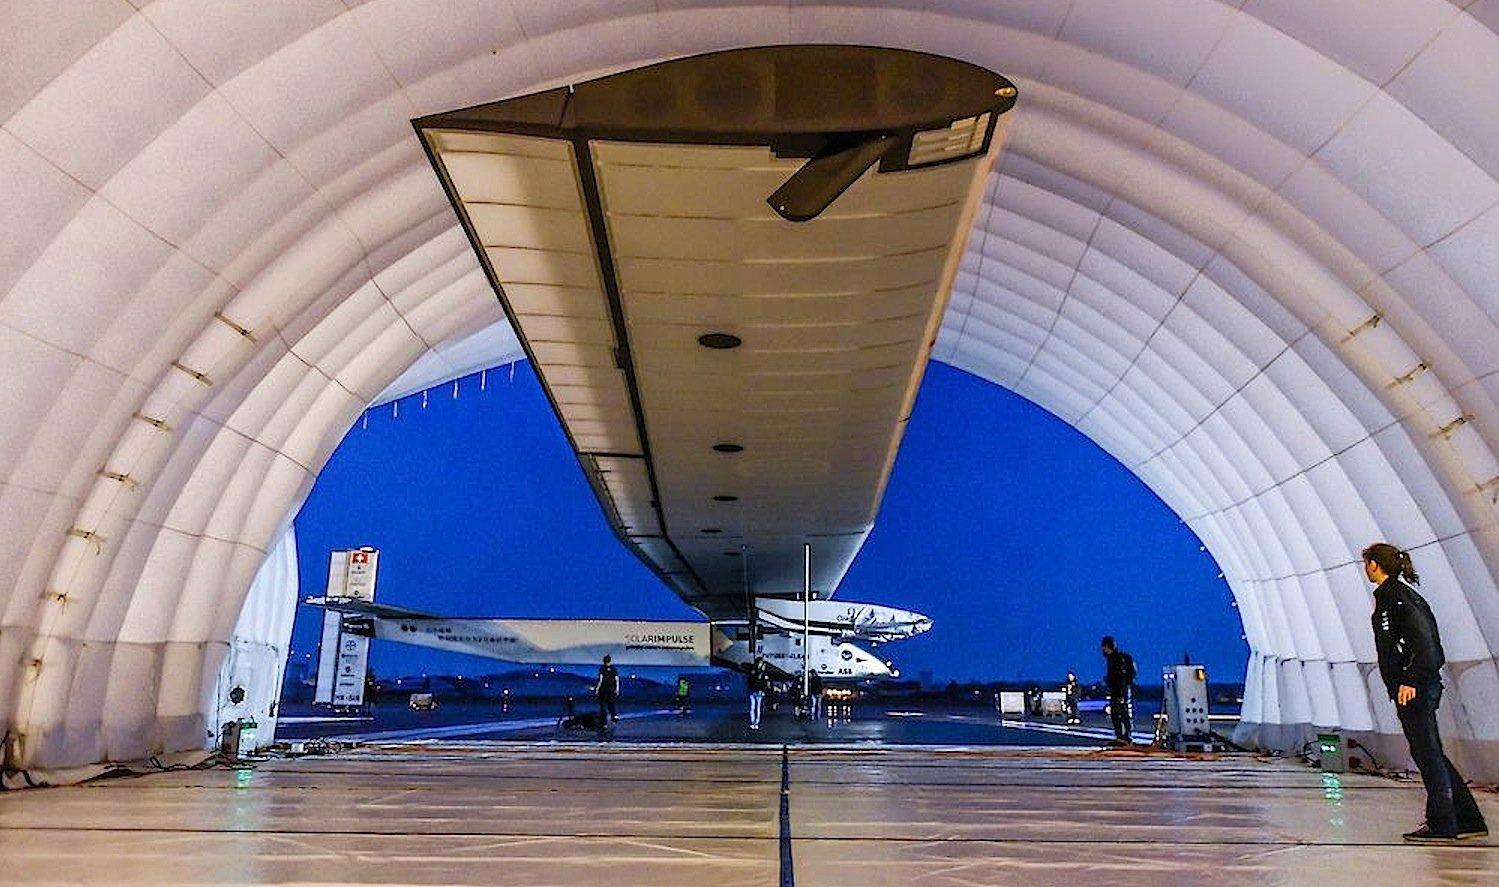 Solar Impulse 2 im mobilen Hangar: Mechaniker müssen einen Flügel reparieren, den Windböen bei der Landung in Nagoya beschädigt haben.